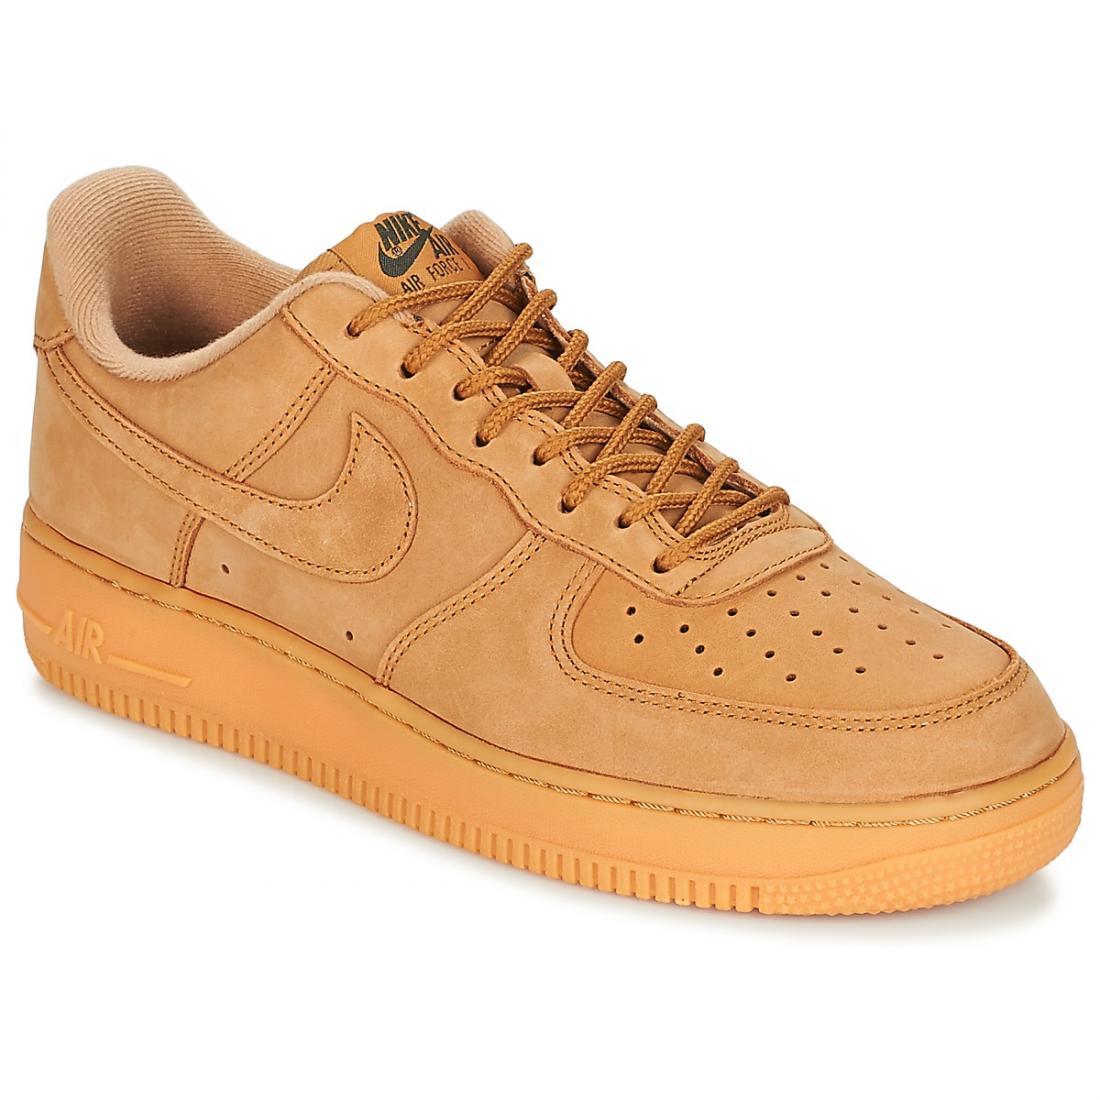 nike chaussure brun